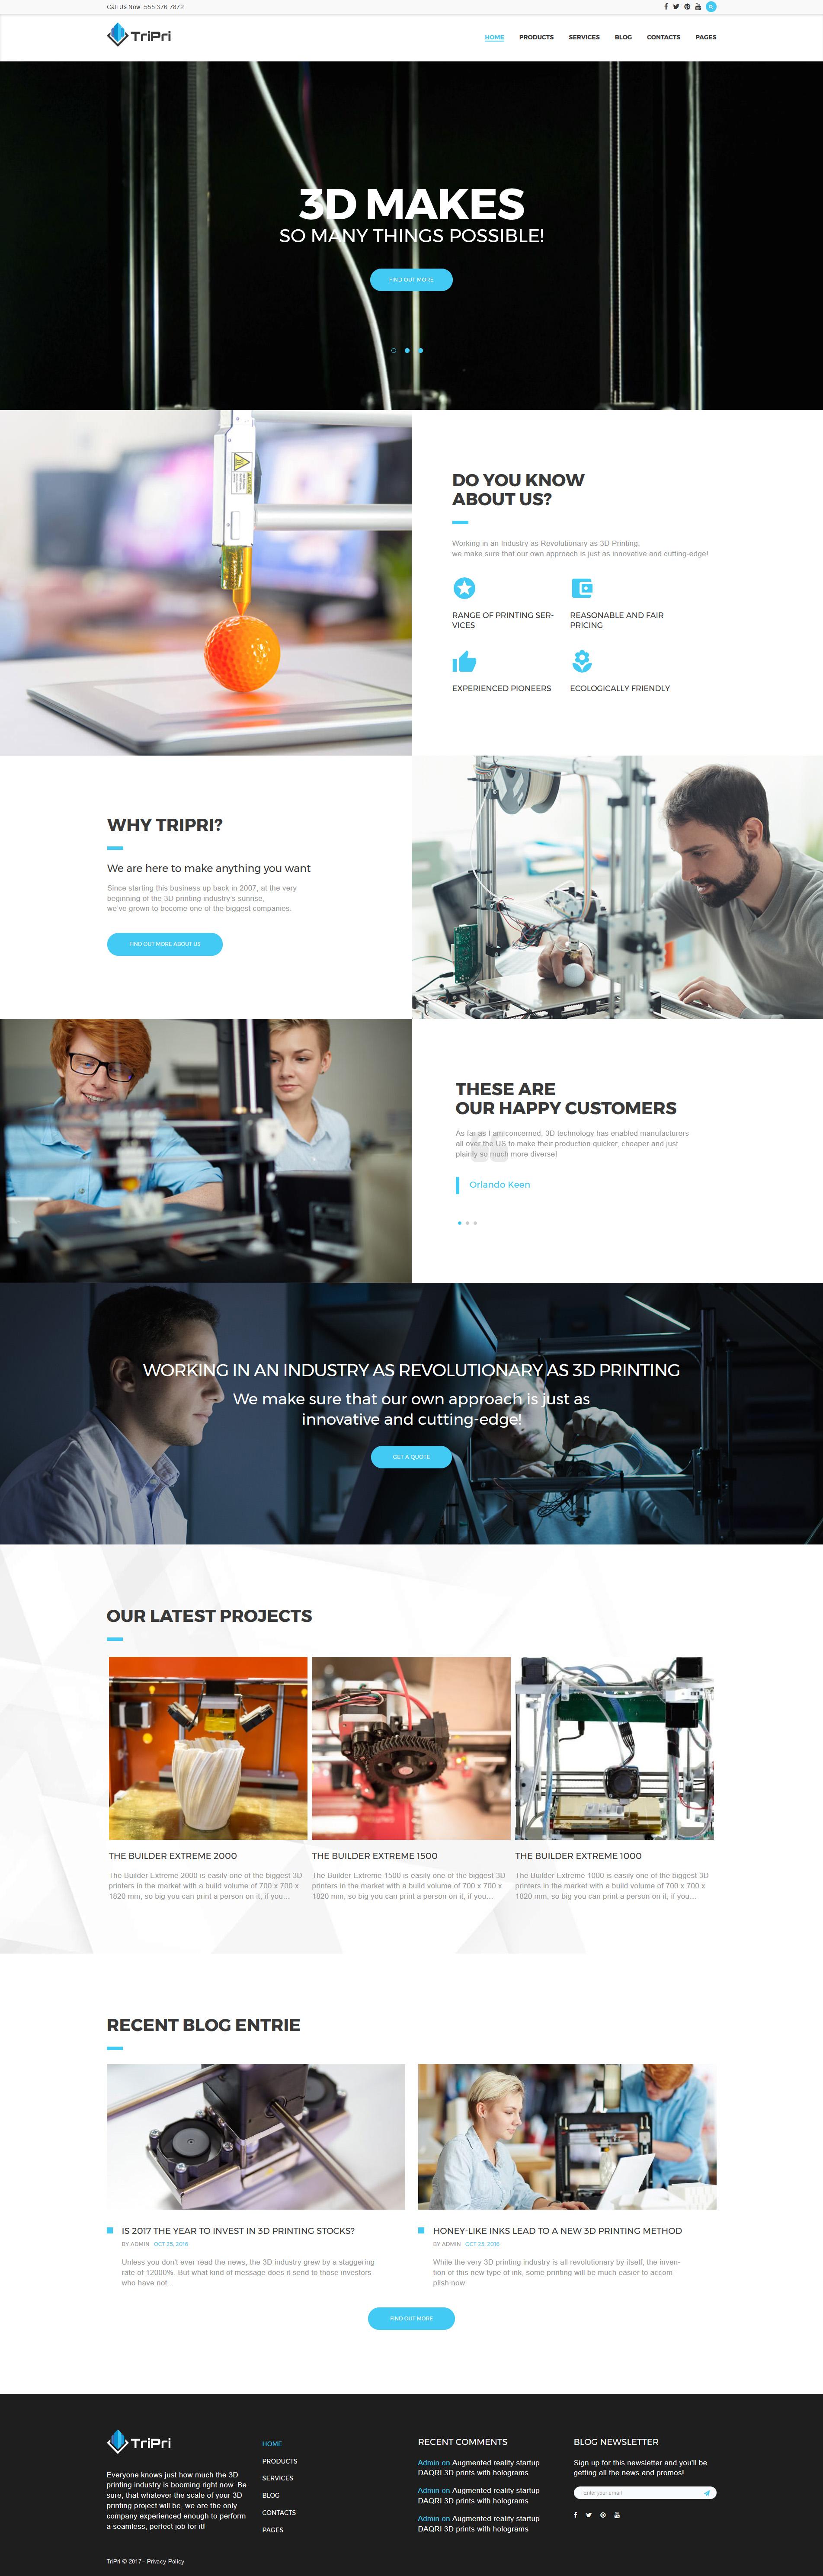 Responsive 3D Printing Services Wordpress #63387